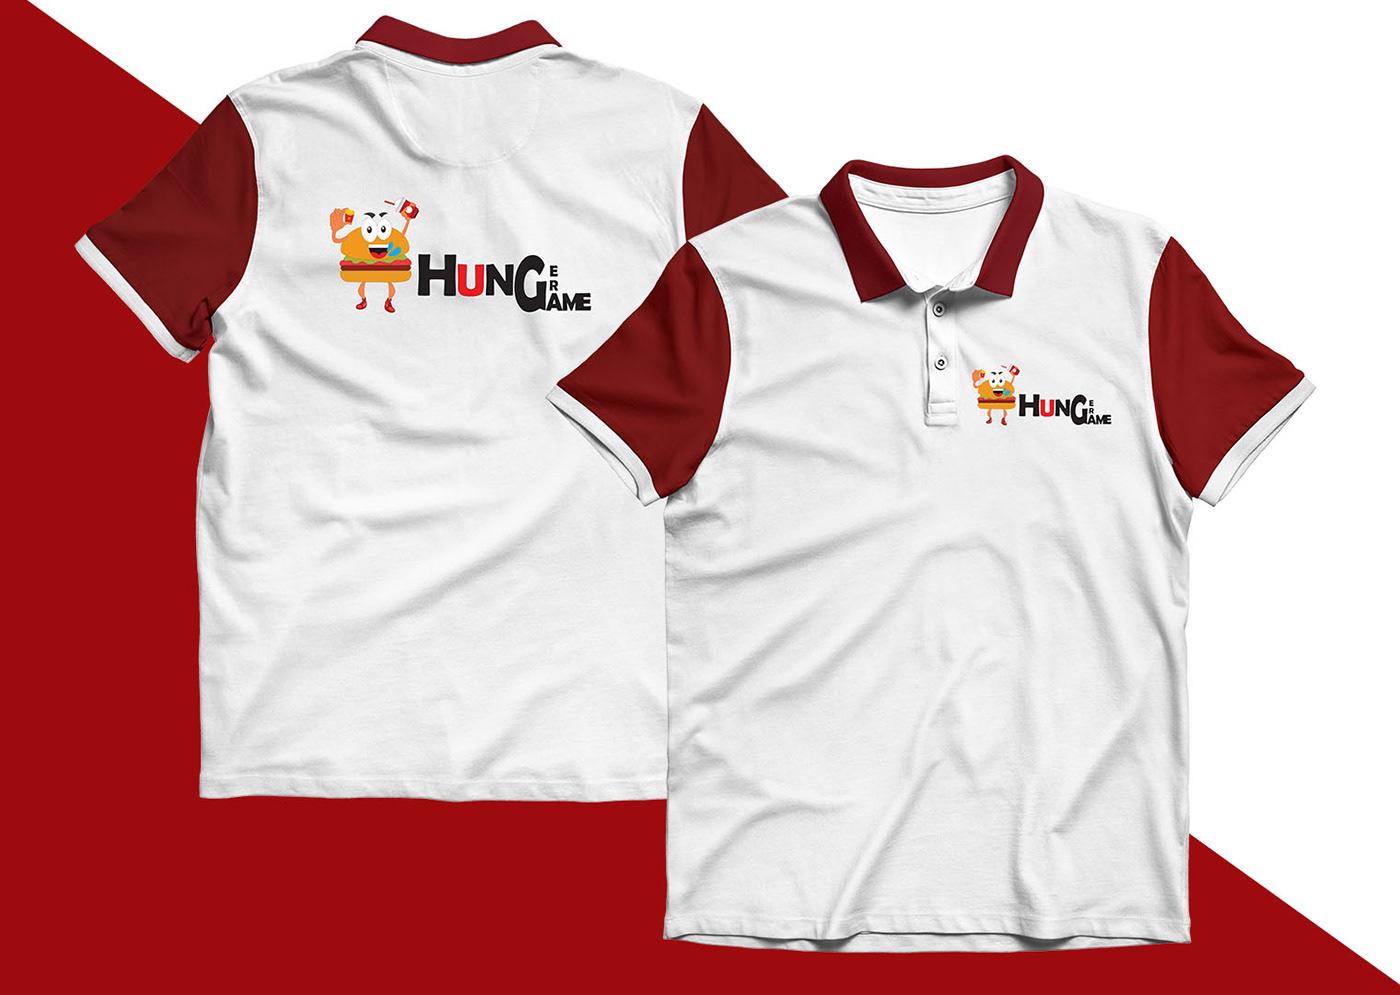 Image may contain: clothing, active shirt and sports uniform